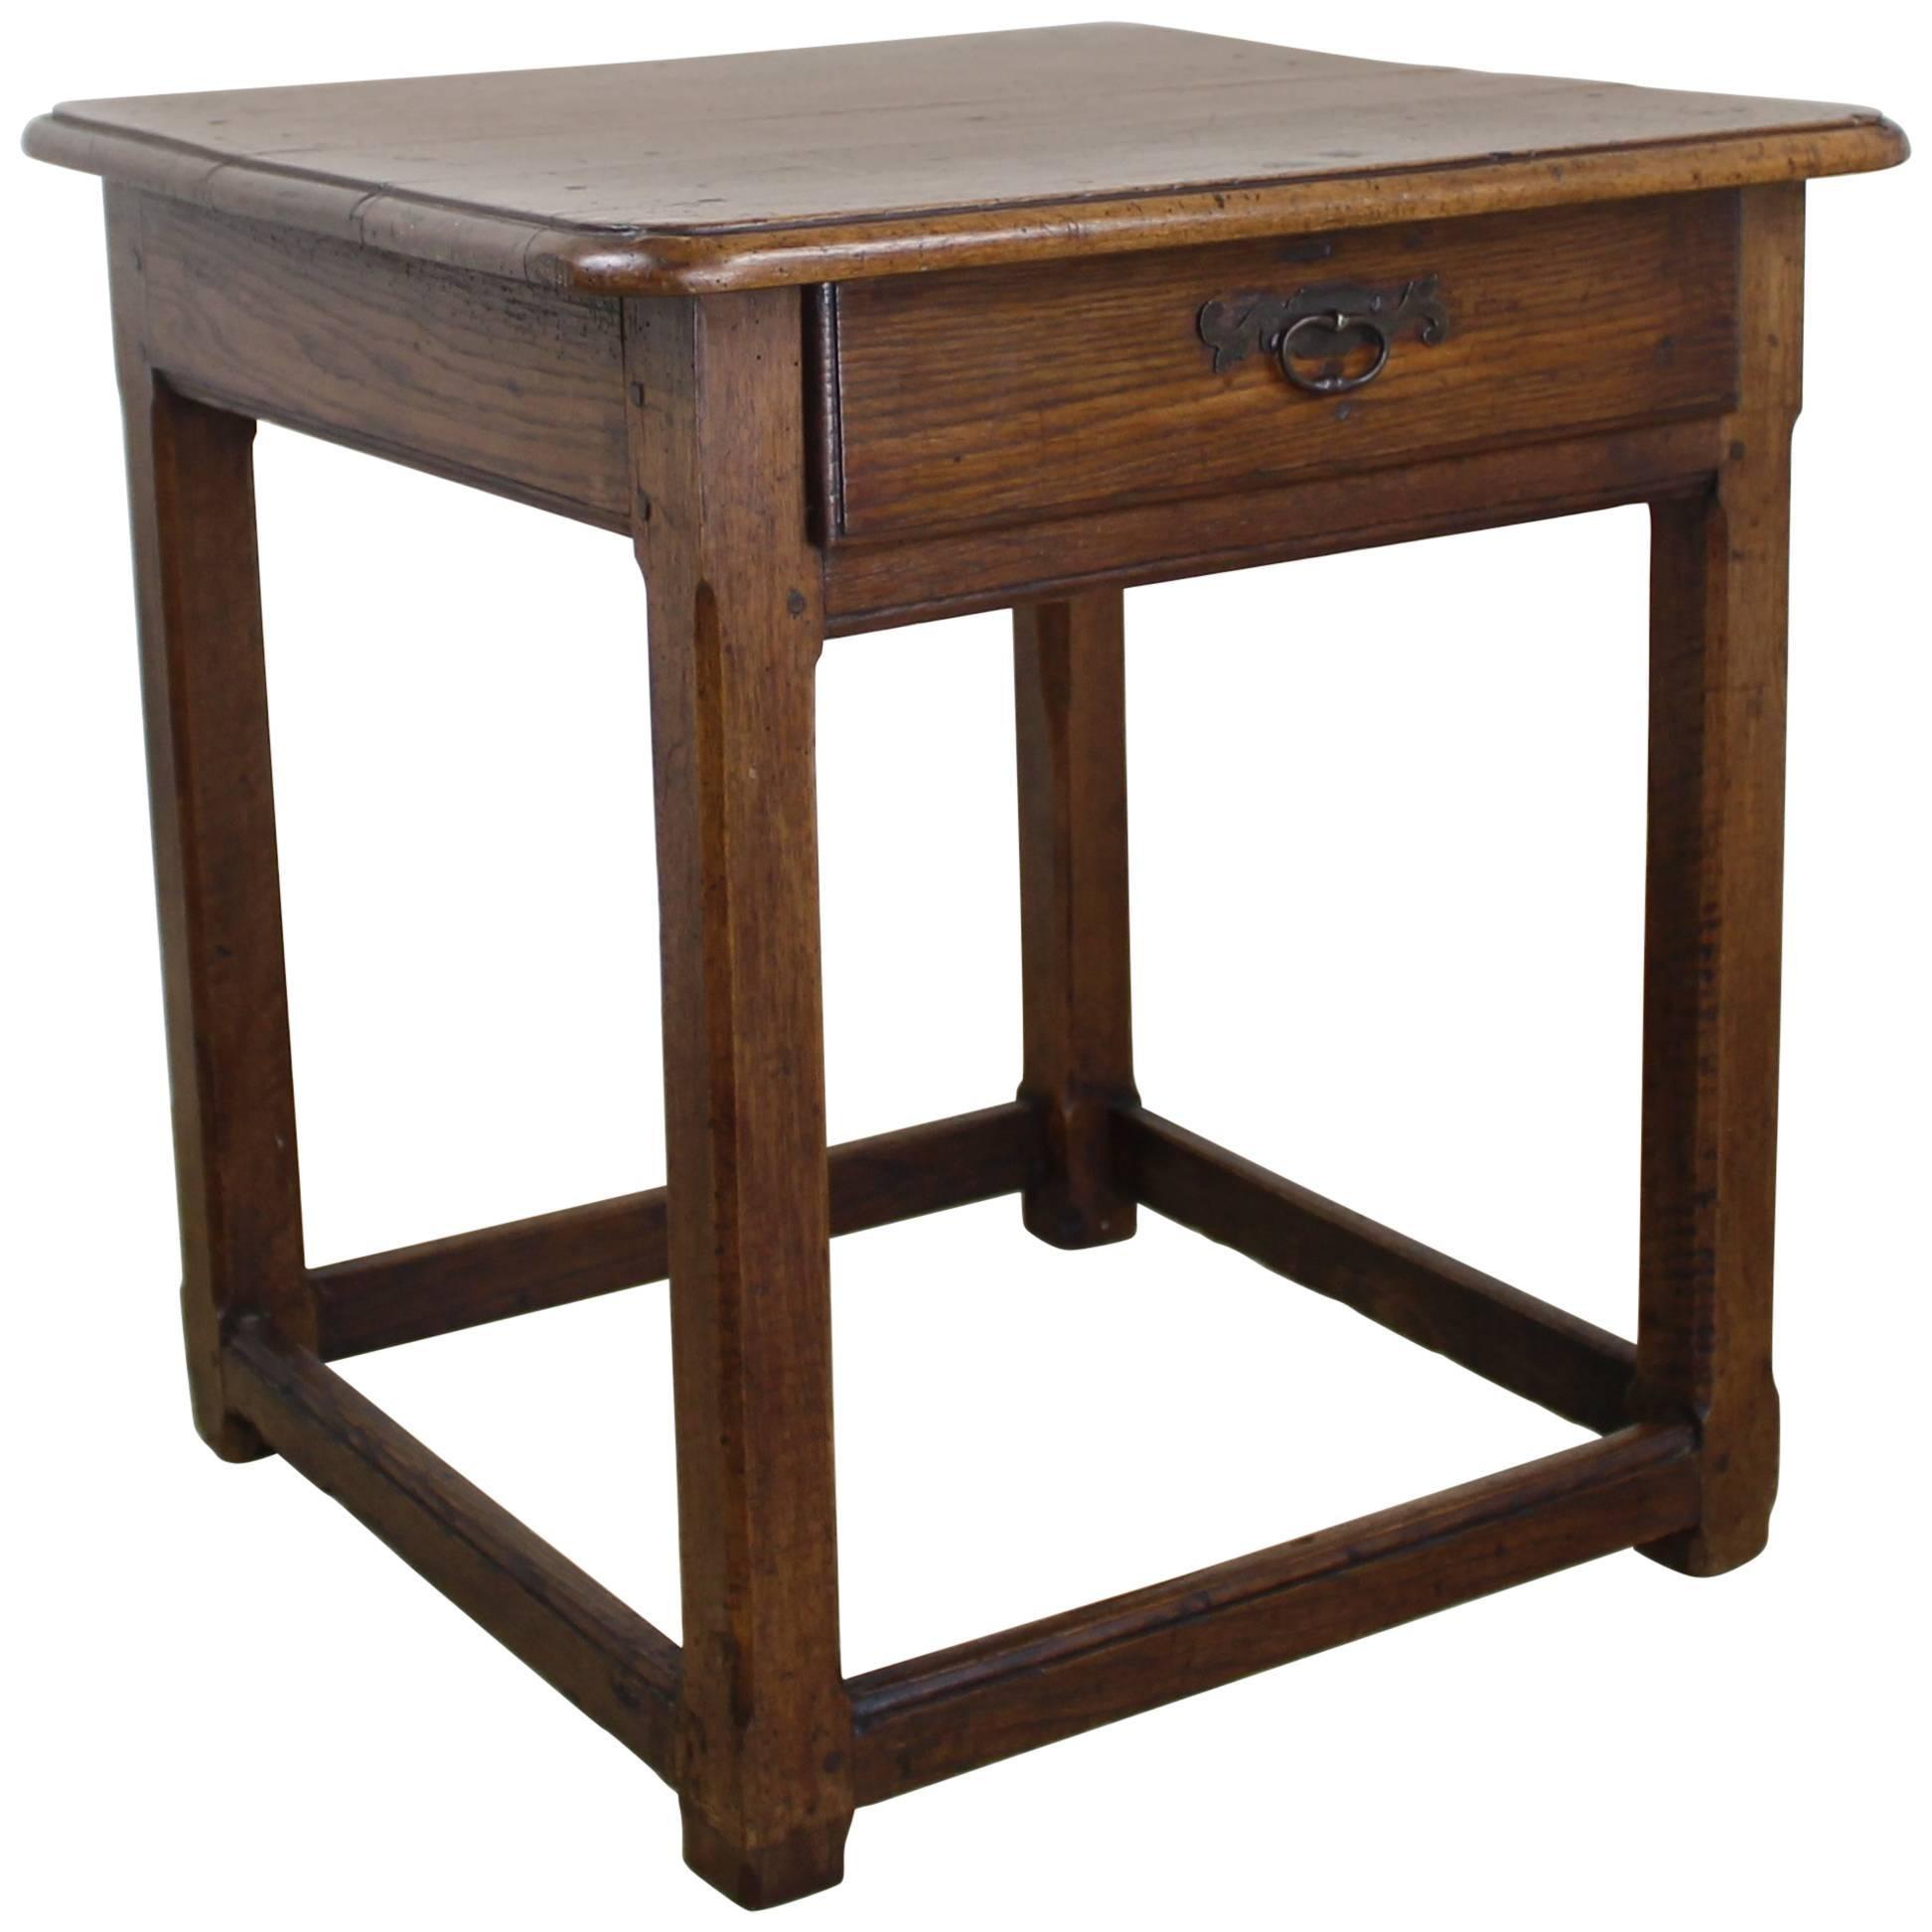 Antique Walnut Side Table, Original Iron Hardware